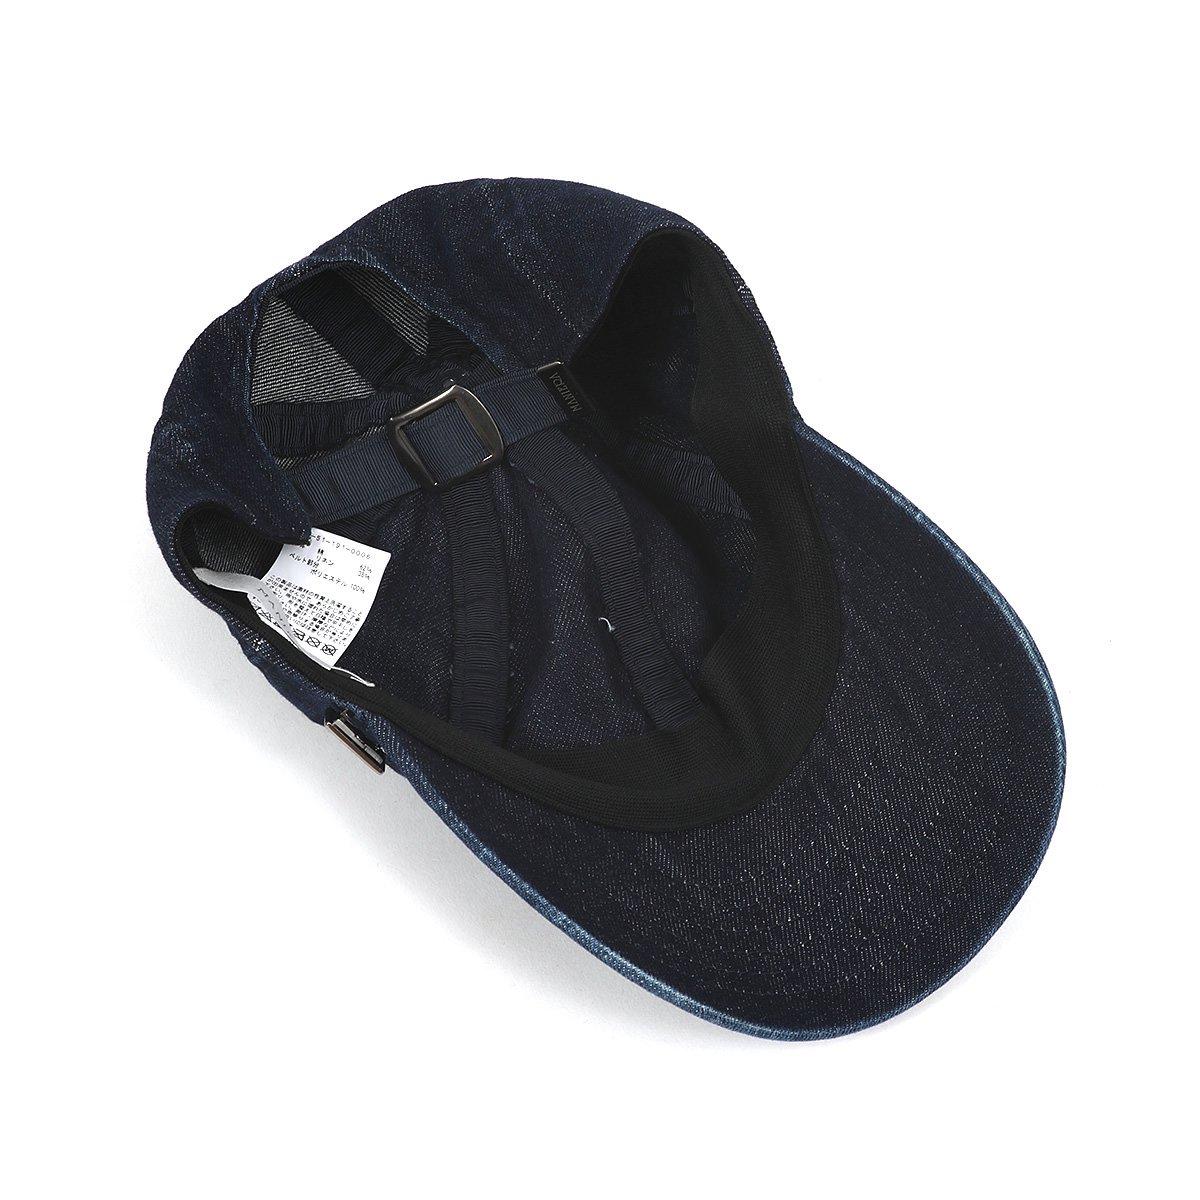 INDIGO 8PANEL CAP 詳細画像5